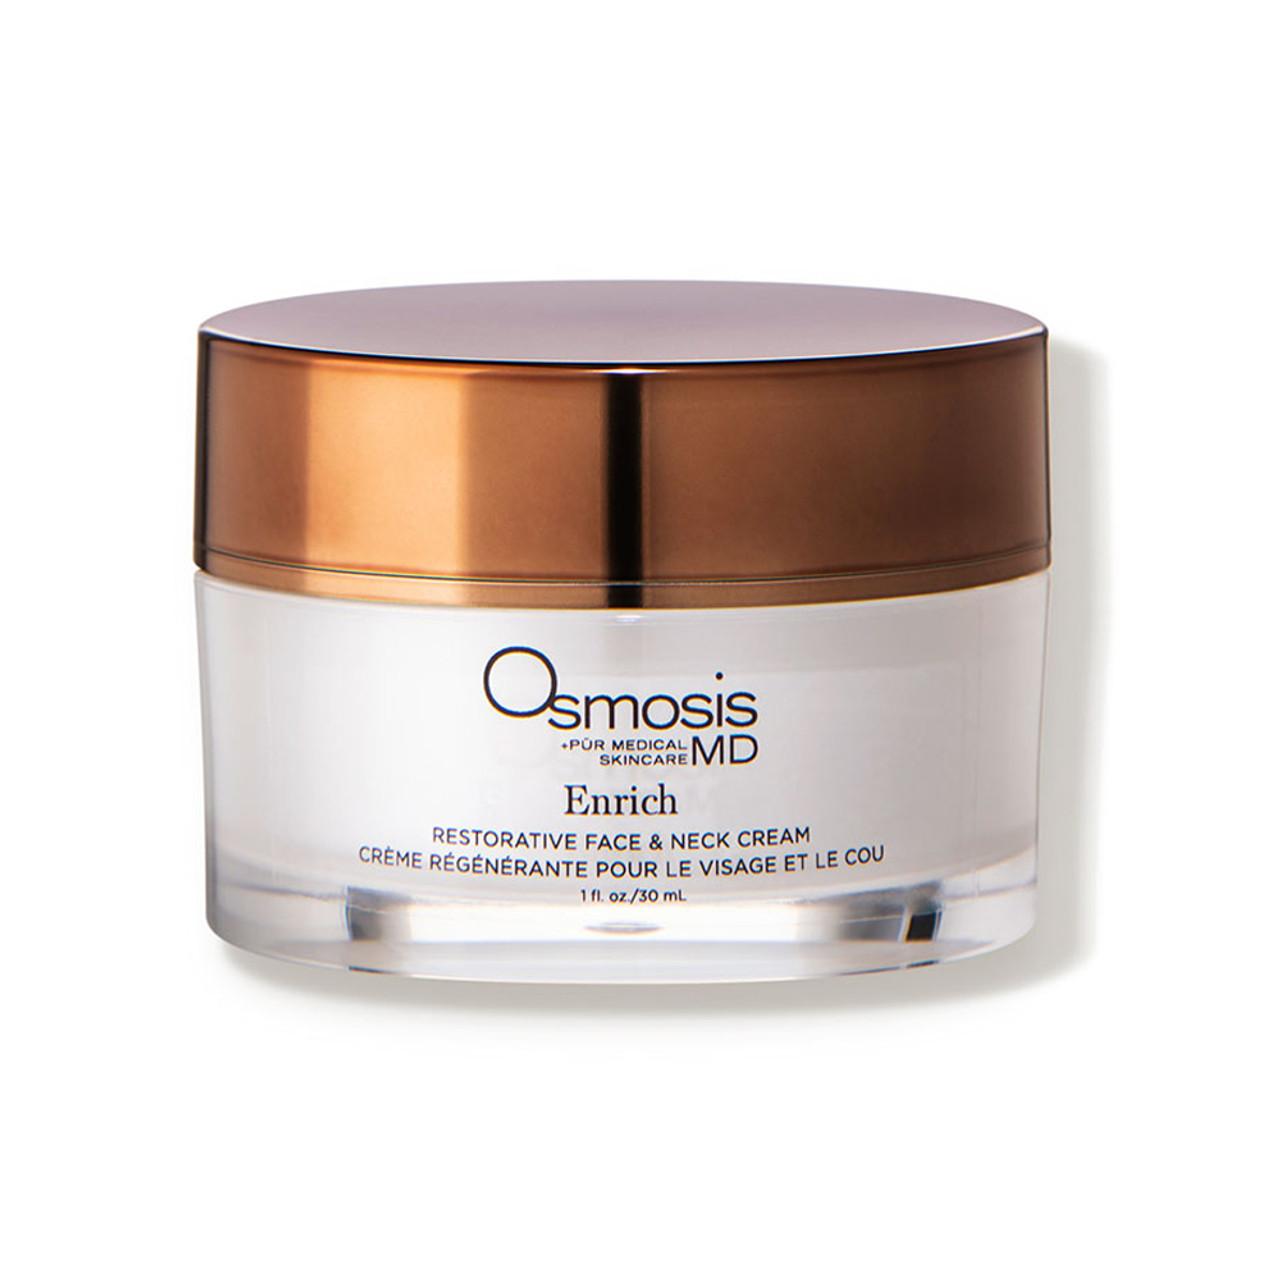 Osmosis +Skincare MD Enrich - Restorative Face & Neck Cream